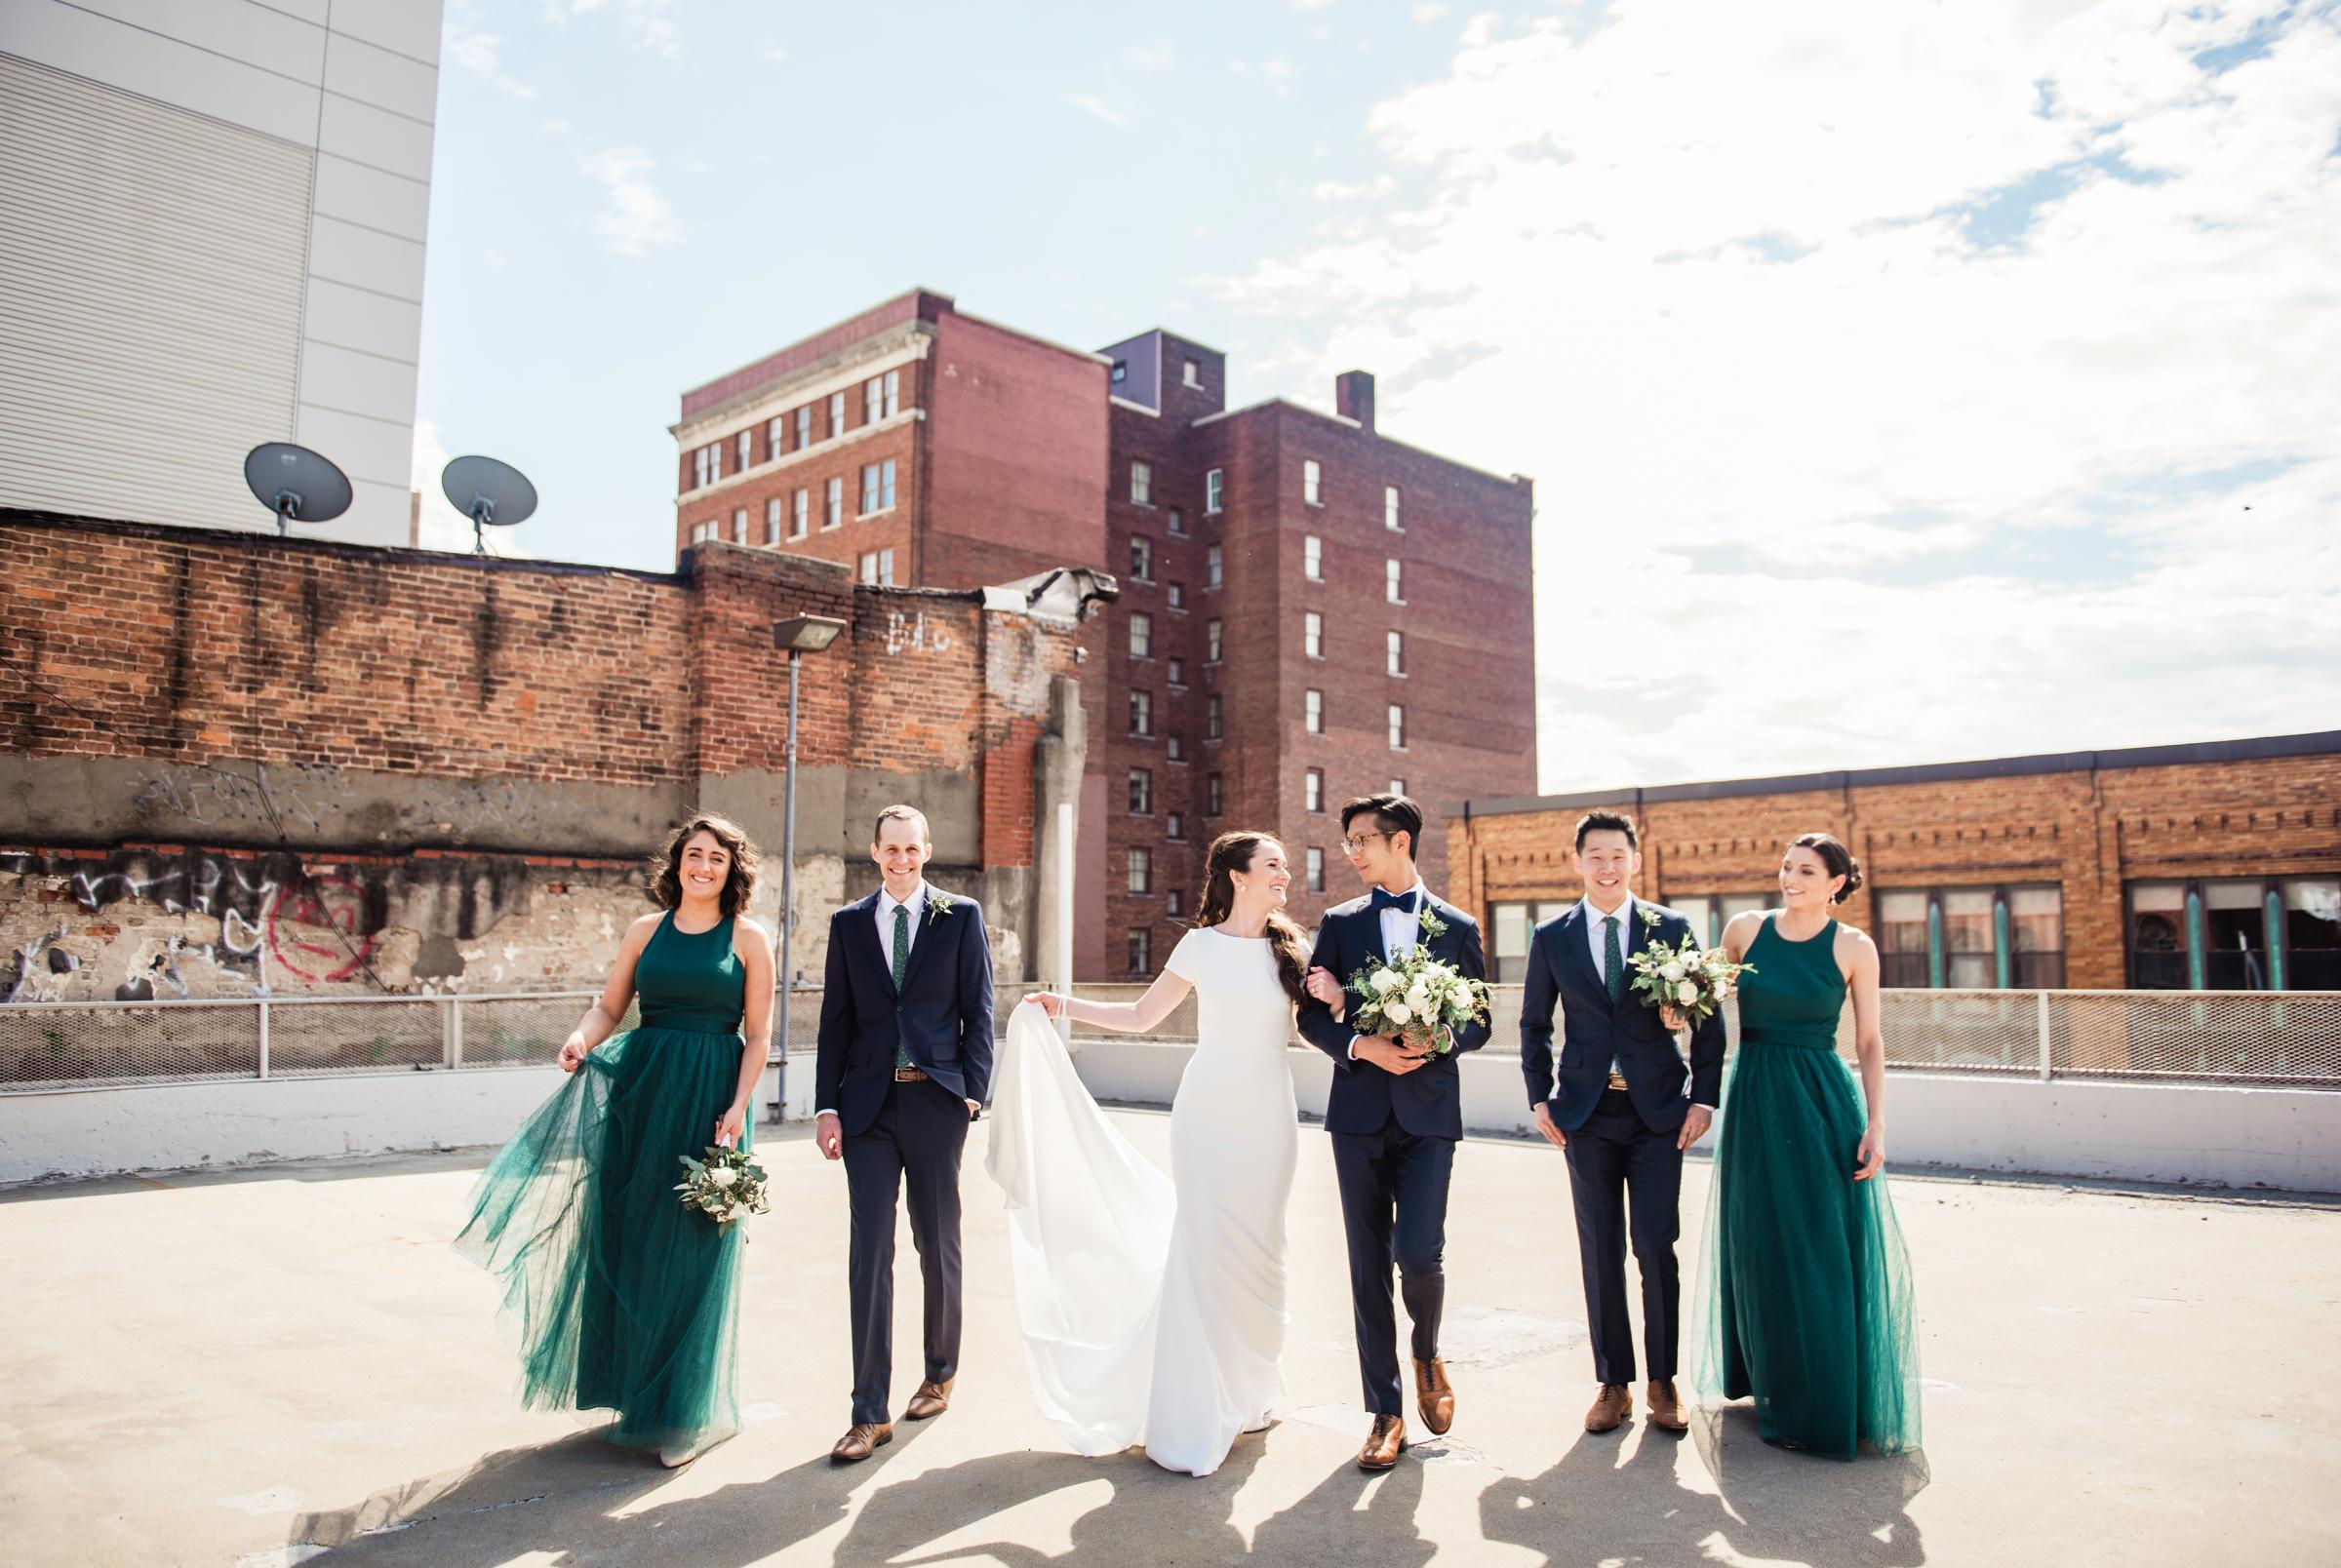 SKY_Armory_Syracuse_Wedding_JILL_STUDIO_Rochester_NY_Photographer_DSC_5563.jpg